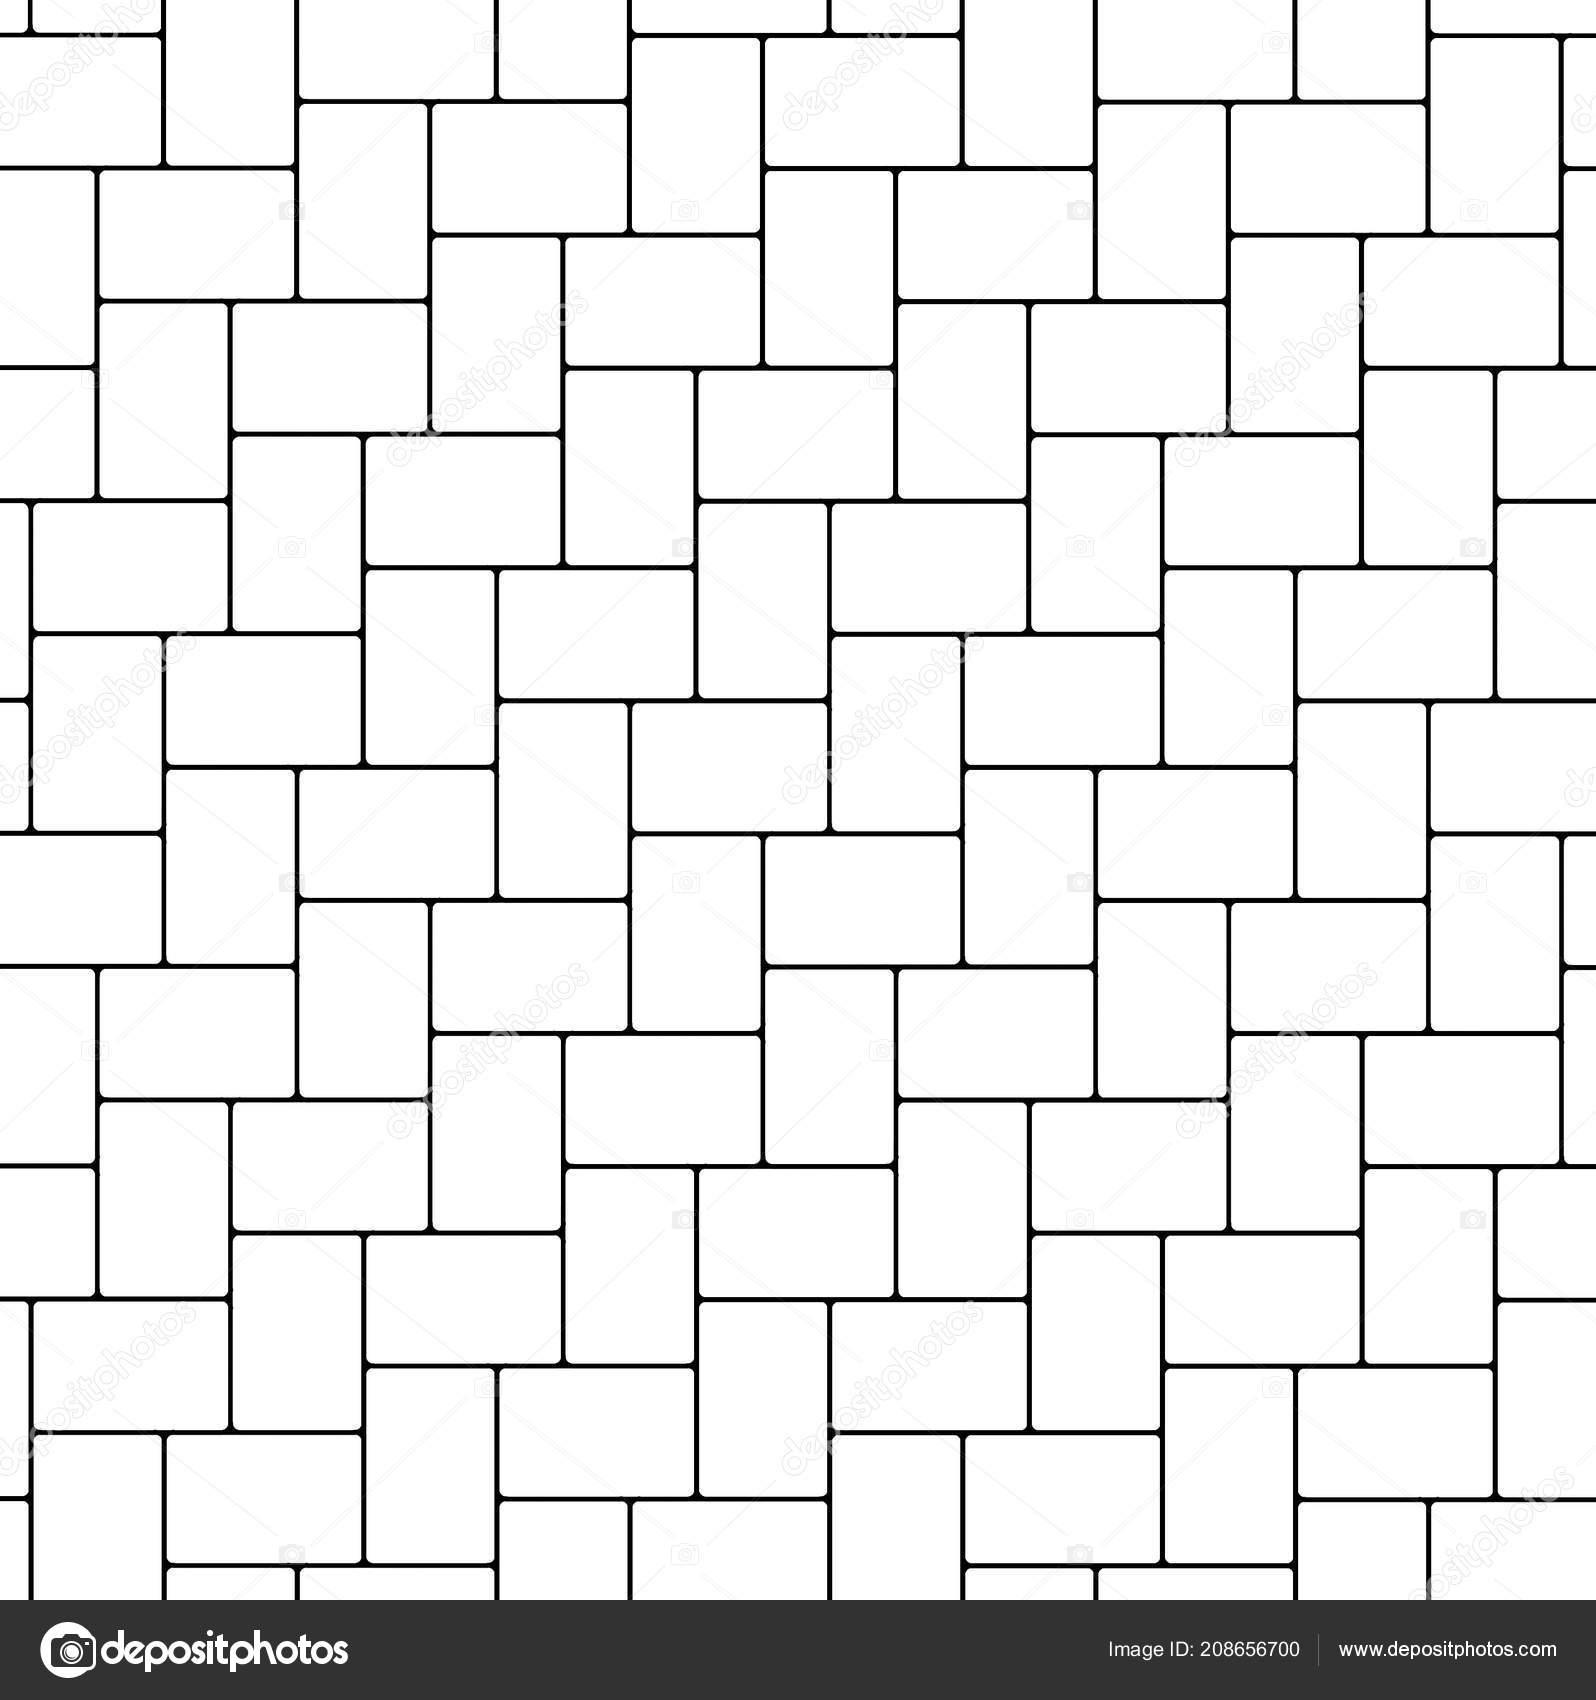 Herringbone Tile Texture Seamless Herringbone Pattern Paving Seamless Texture Bump Displace Stock Photo C Threedicube 208656700